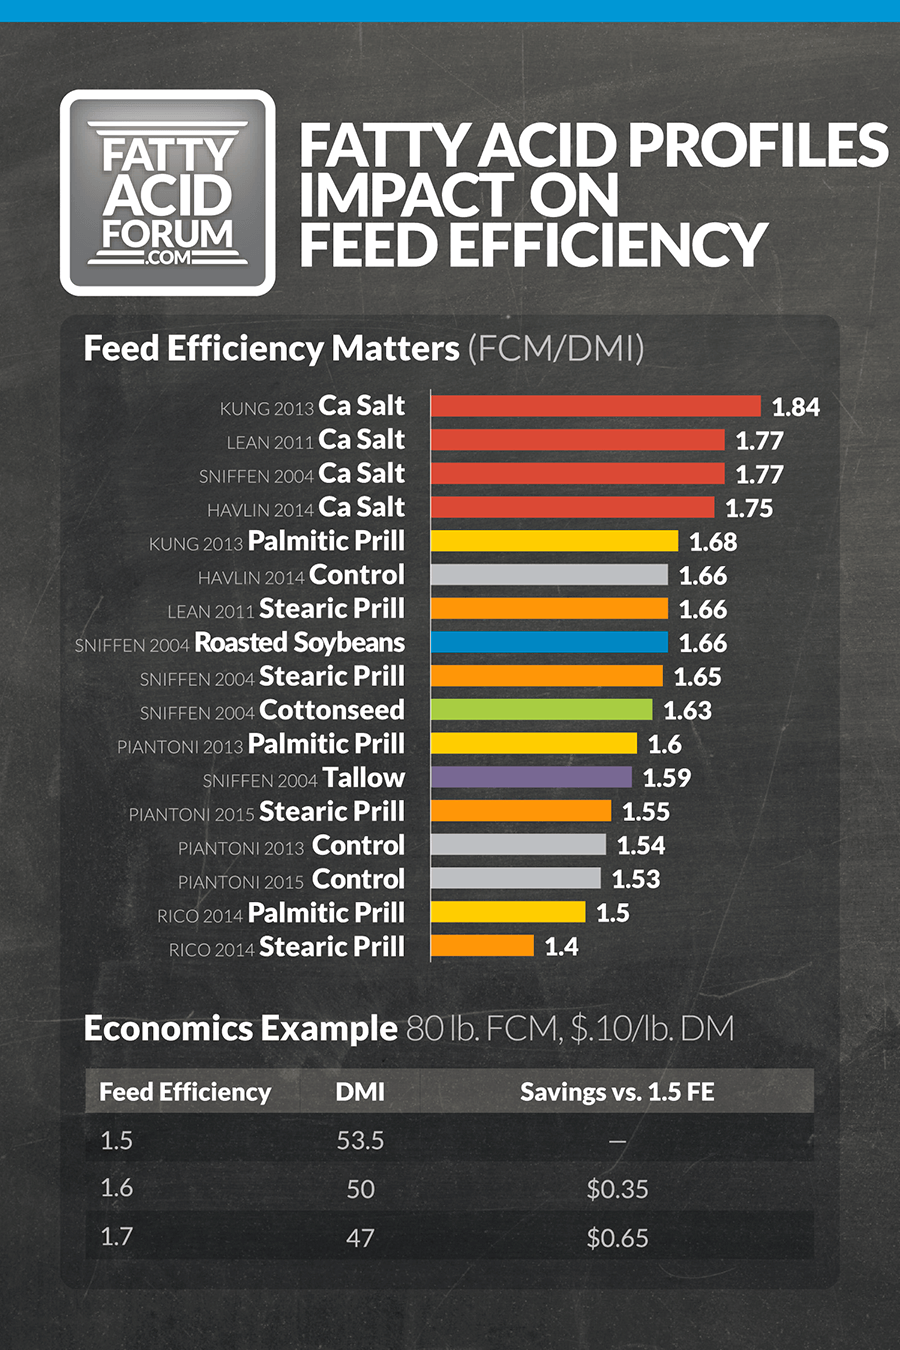 Fatty Acid Profiles Impact On Feed Efficiency